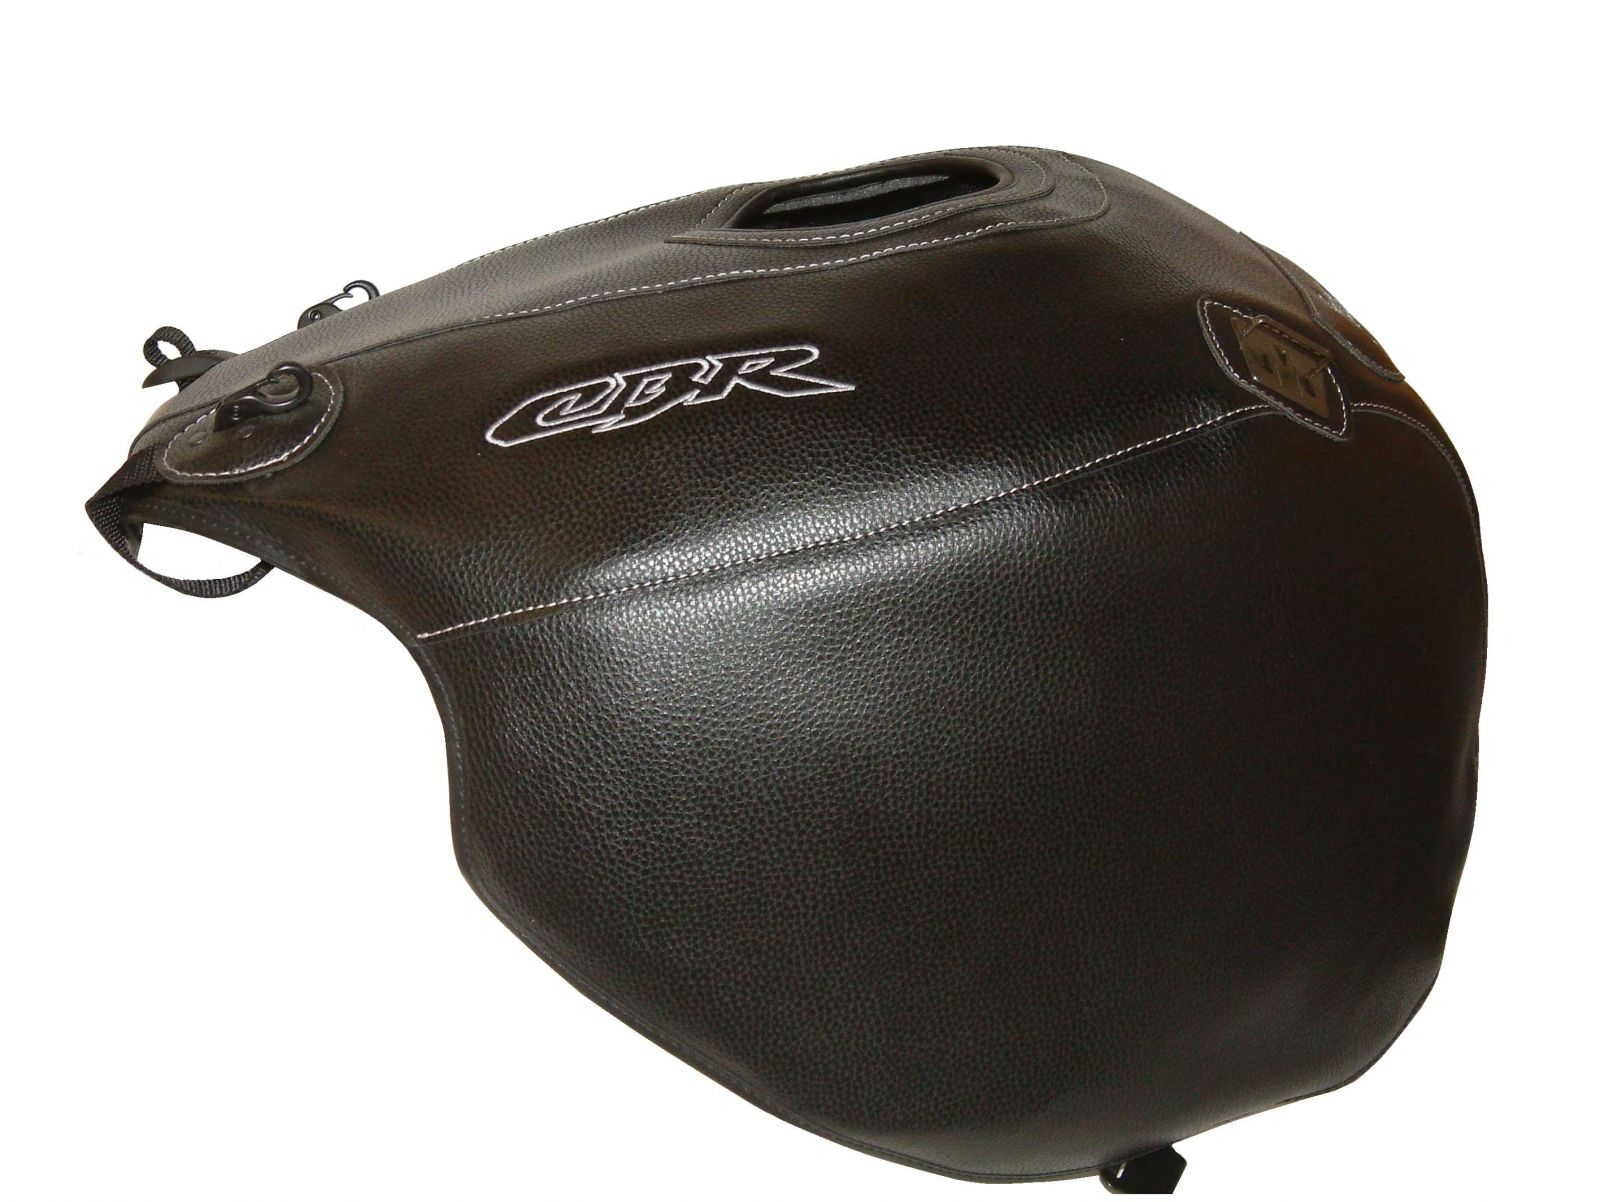 Capa de depósito TPR2374 - HONDA CBR 600 F [1999-2007]